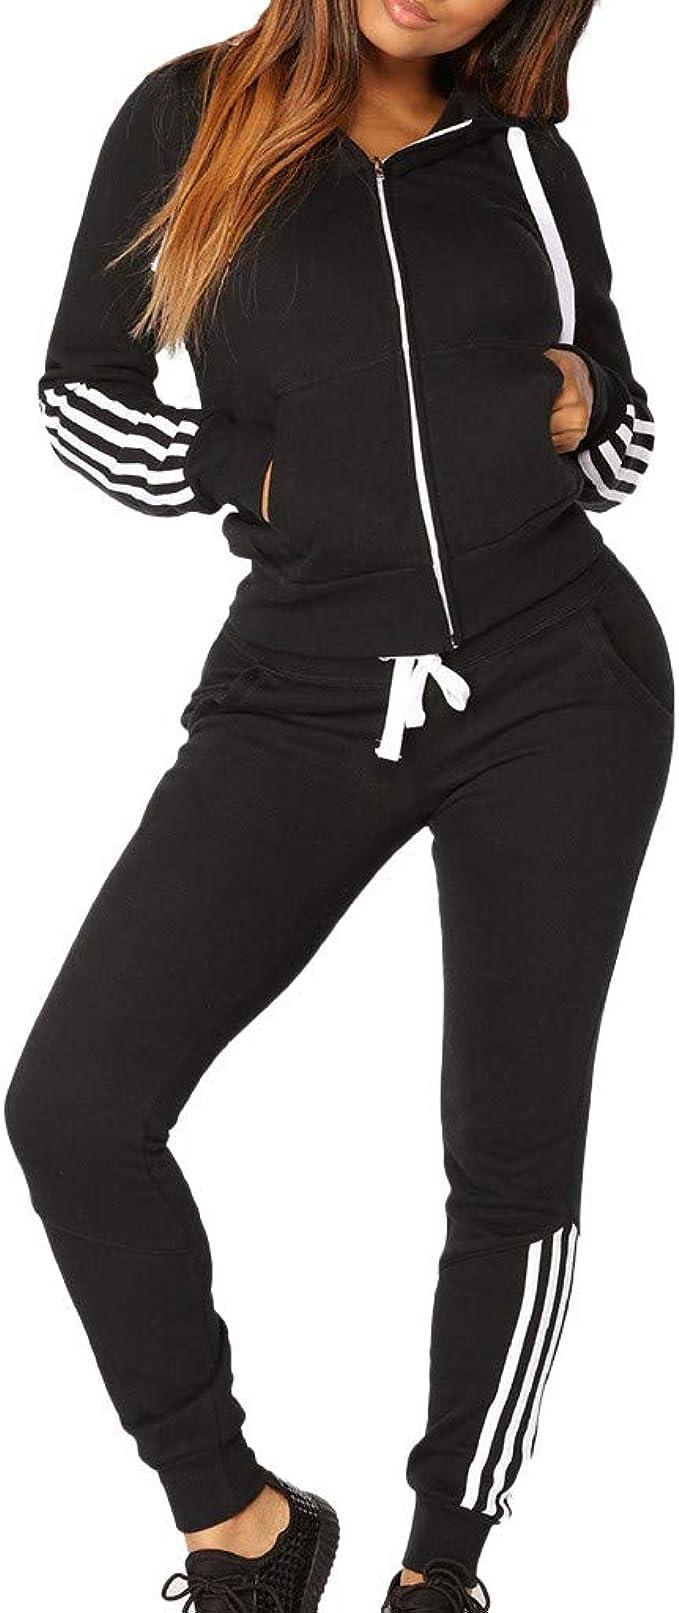 UK Women/'s Tracksuit Hoodies Sweatshirt Pants Sets Sport Wear Nice Casual Suit